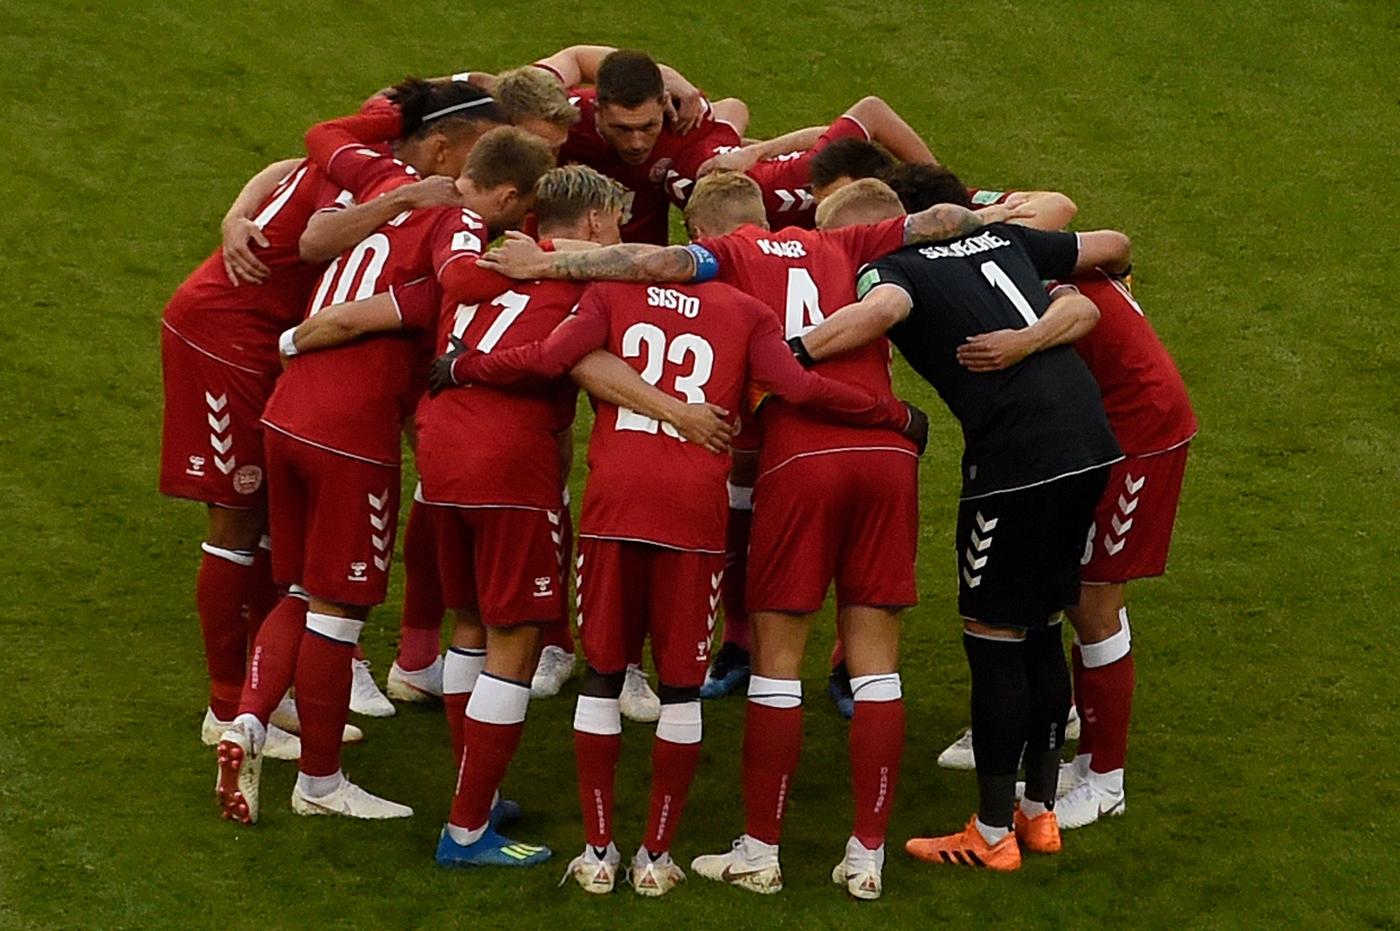 Qualificazioni Europei, Danimarca-Gibilterra pronostico: esito scontato